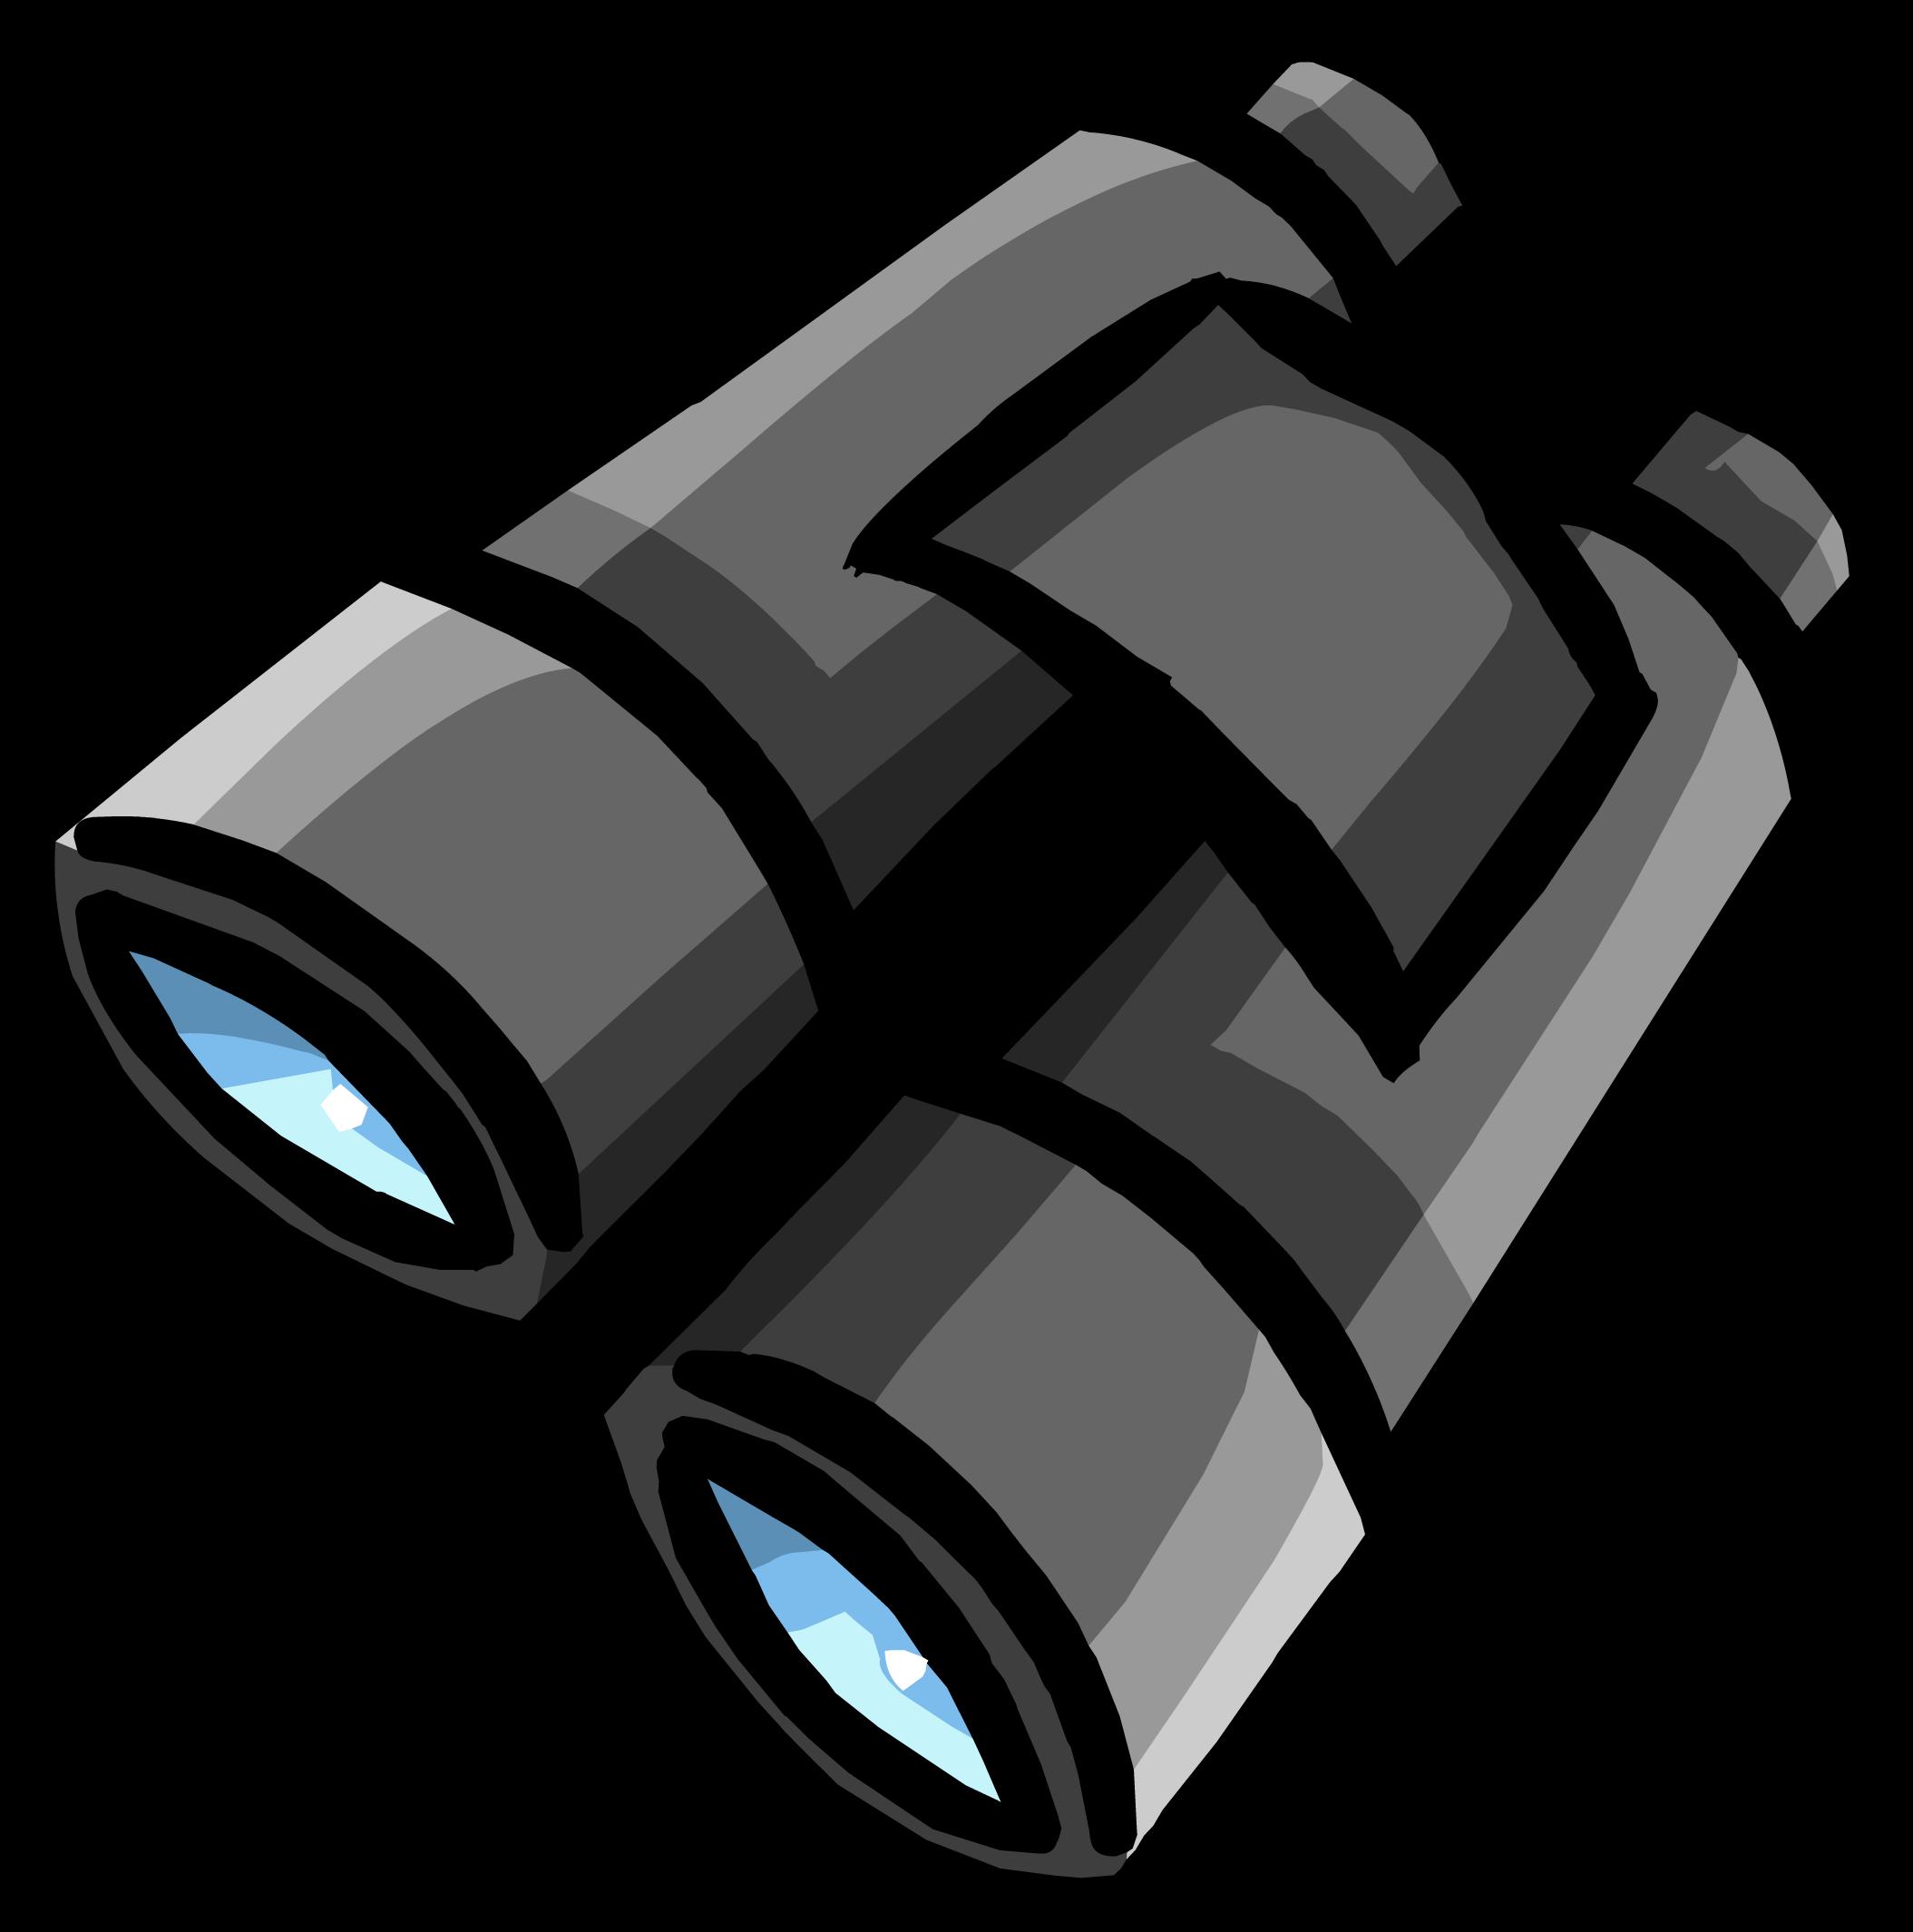 Télécharger photo binoculars clipart png